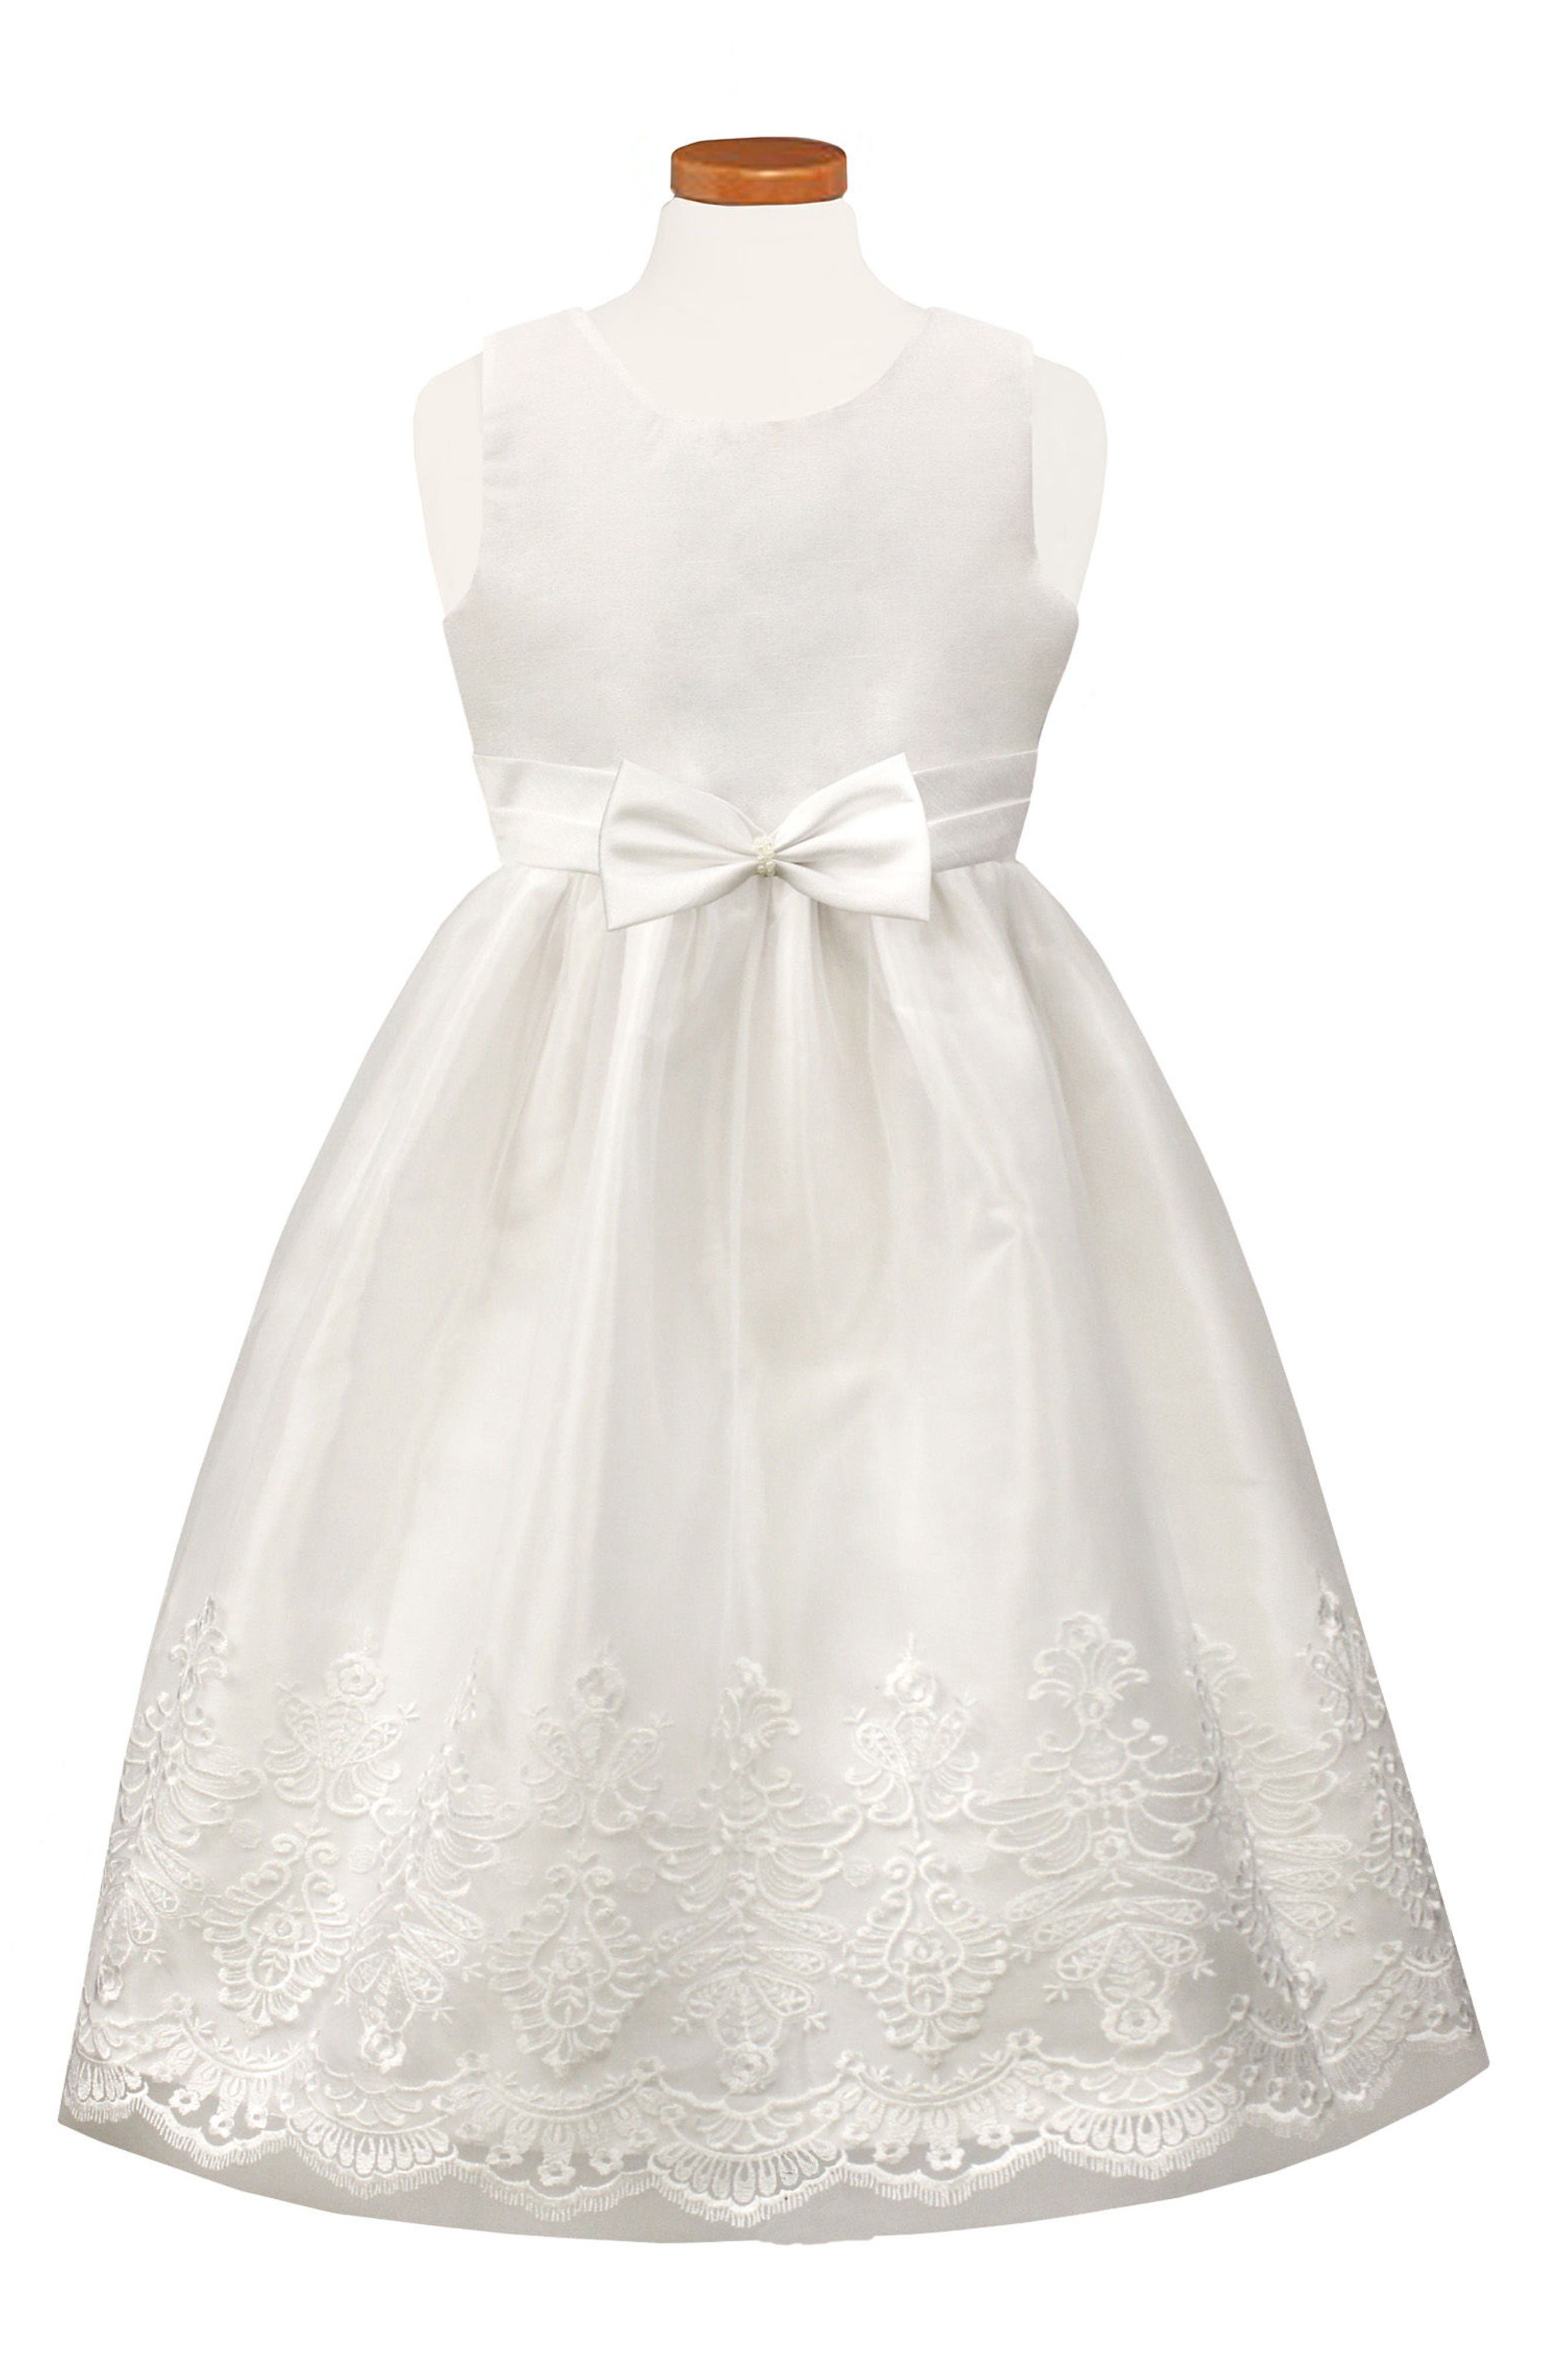 Sorbet Embroidered Tulle Dress (Big Girls)